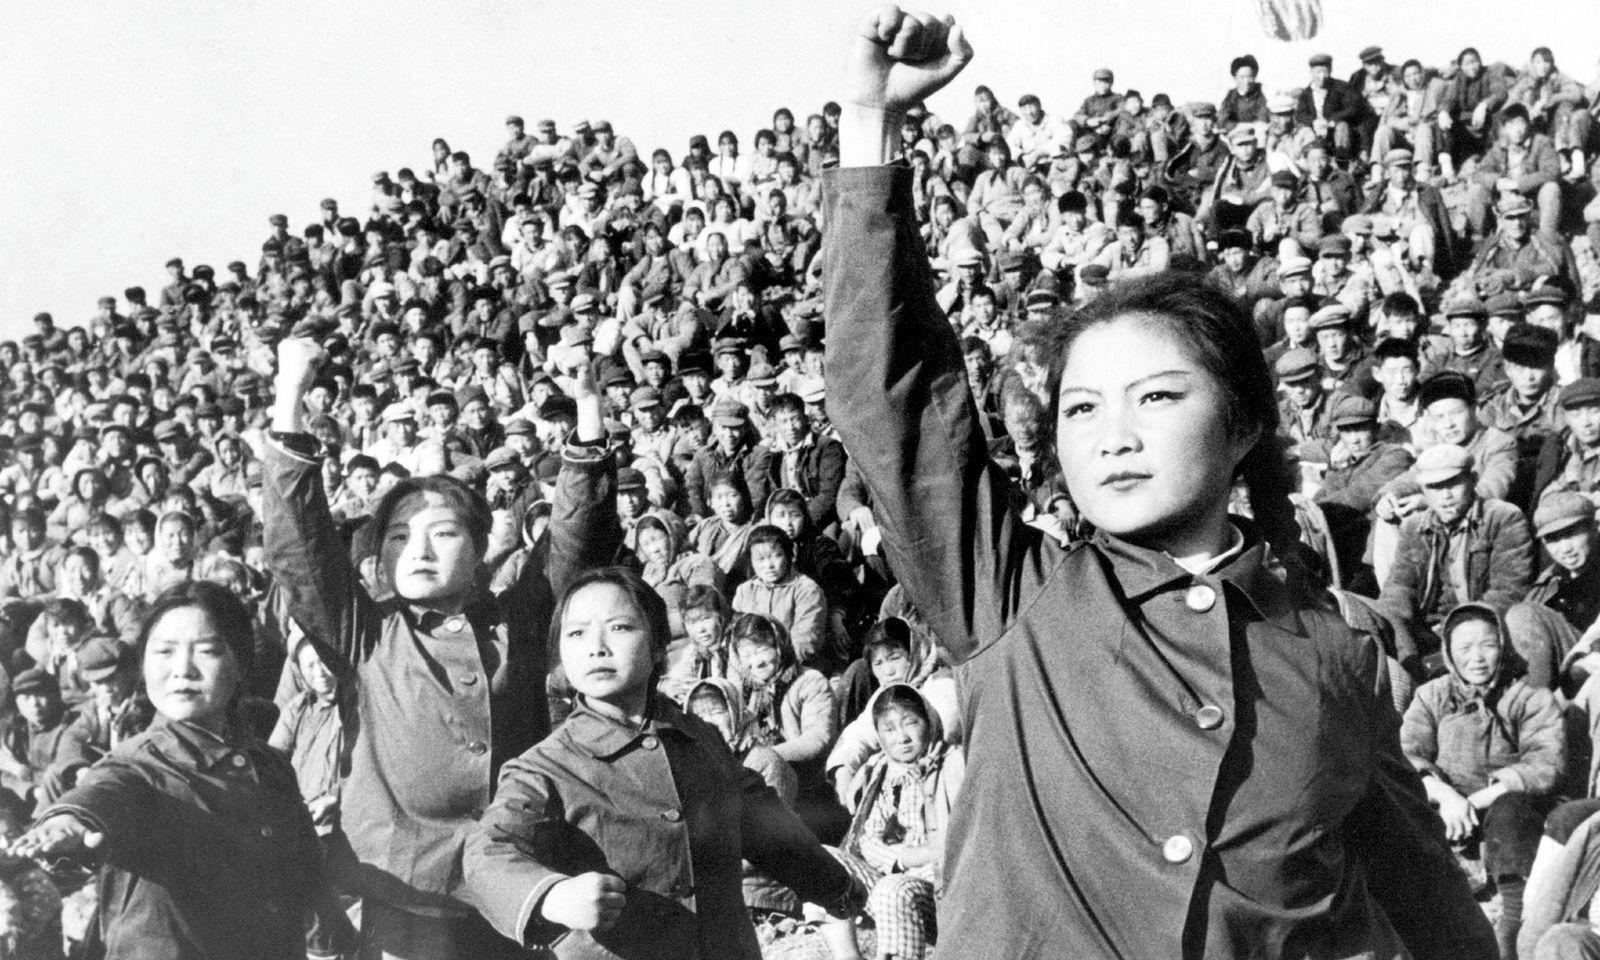 The Great Proletarian Cultural Revolution, commonly known as the Cultural Revolution, was a socio-political movement tha